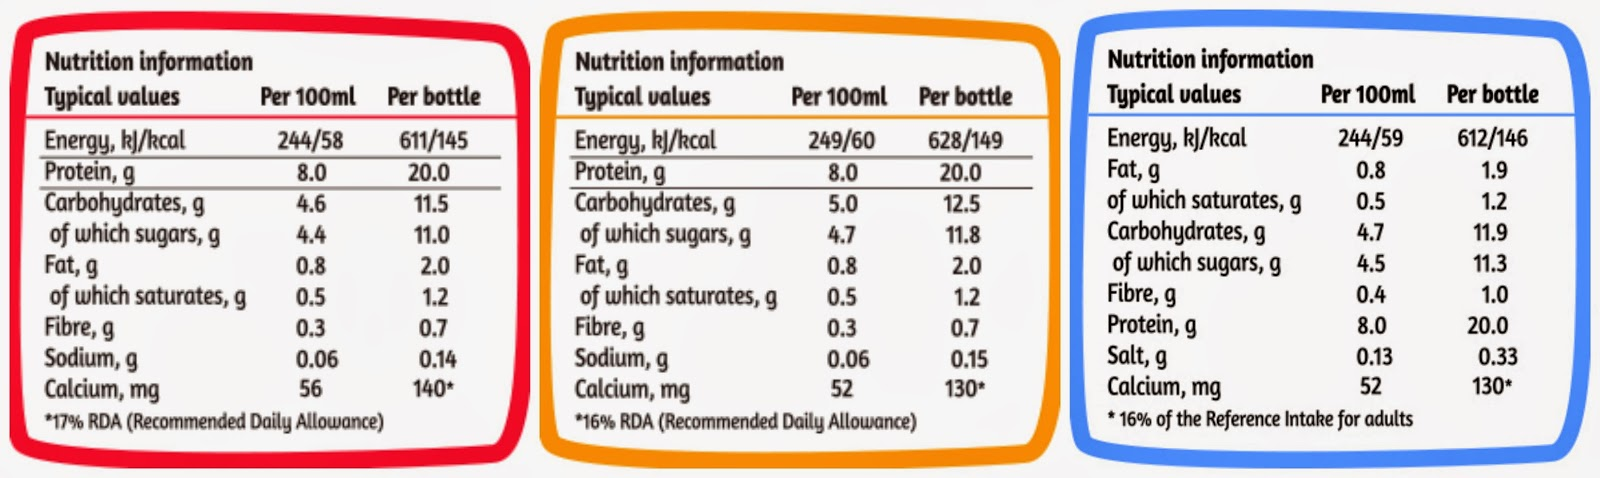 Upbeat_Nutrition_Information.jpg